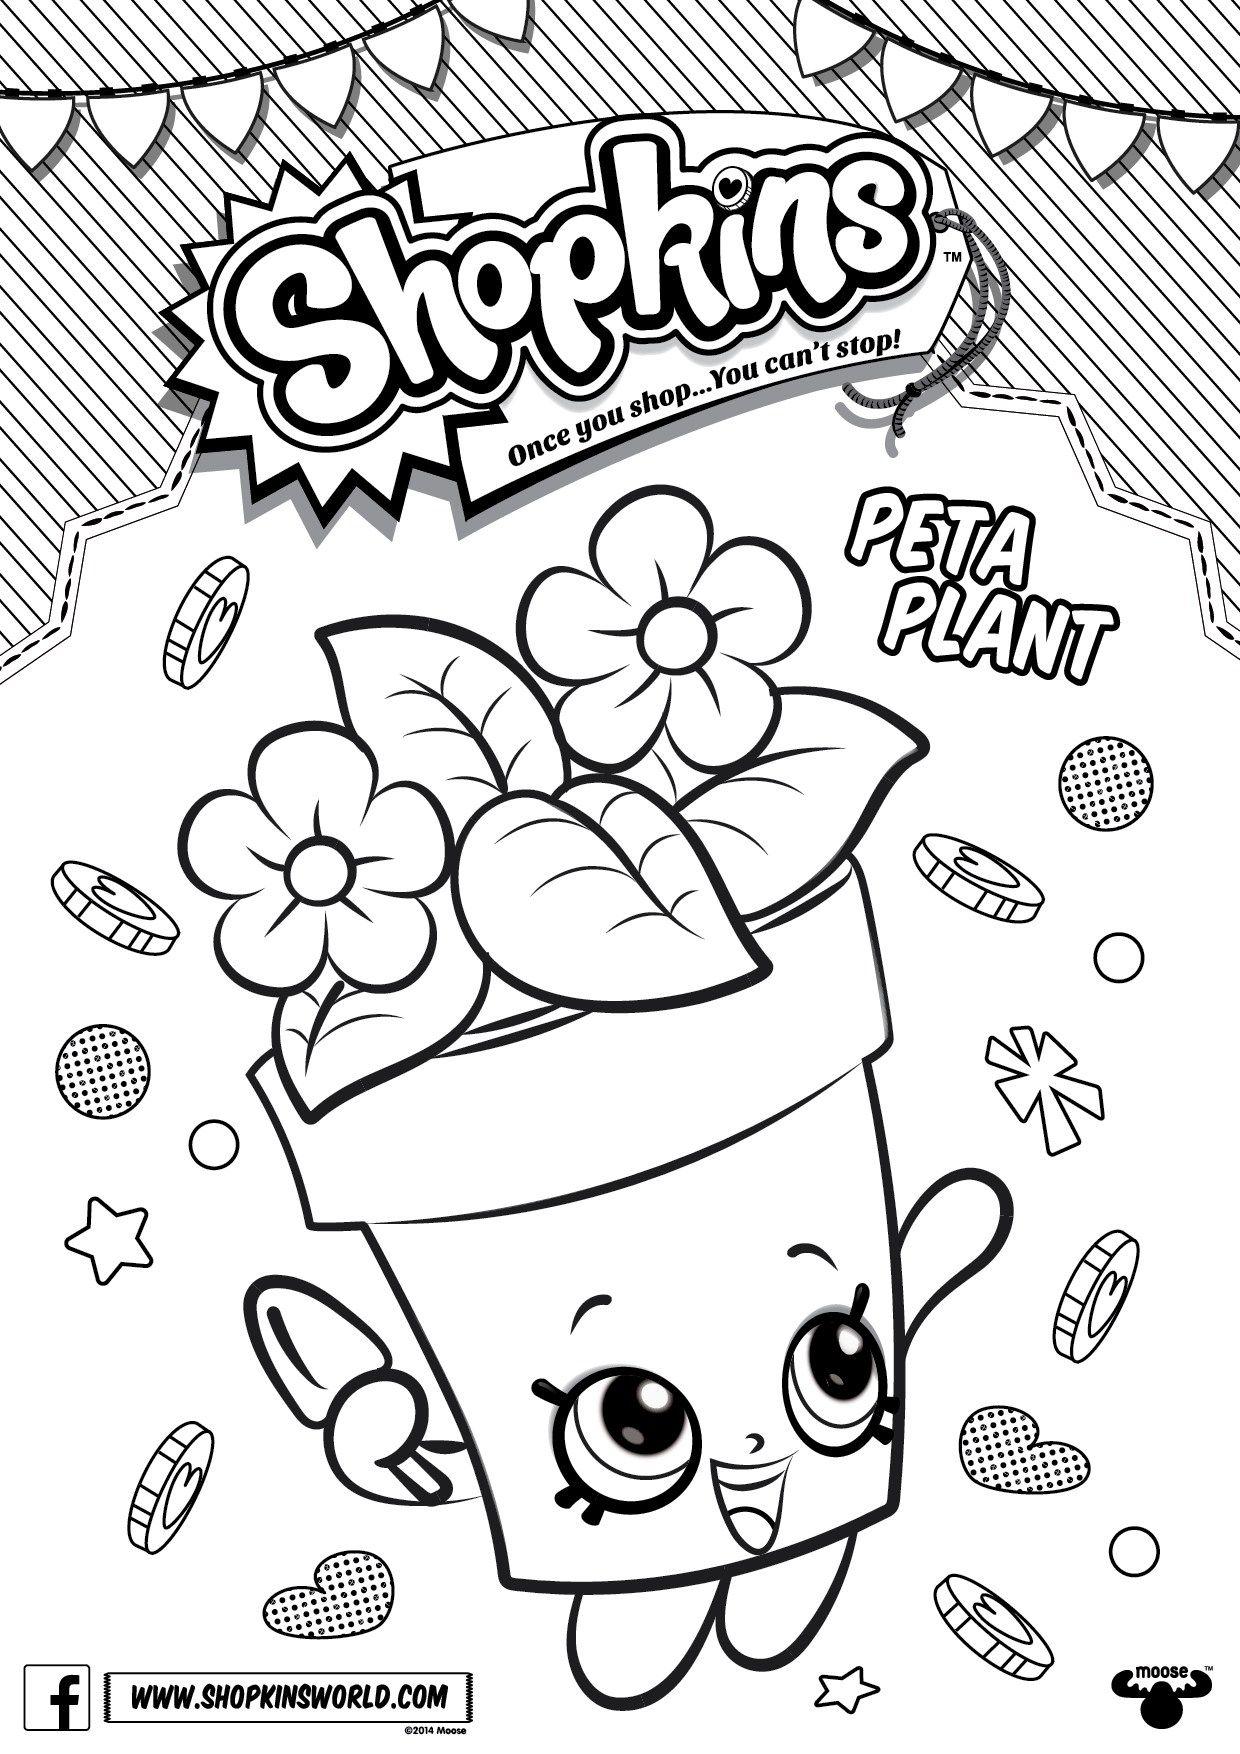 Shopkins Coloring Pages Season 4 Peta Plant Printables